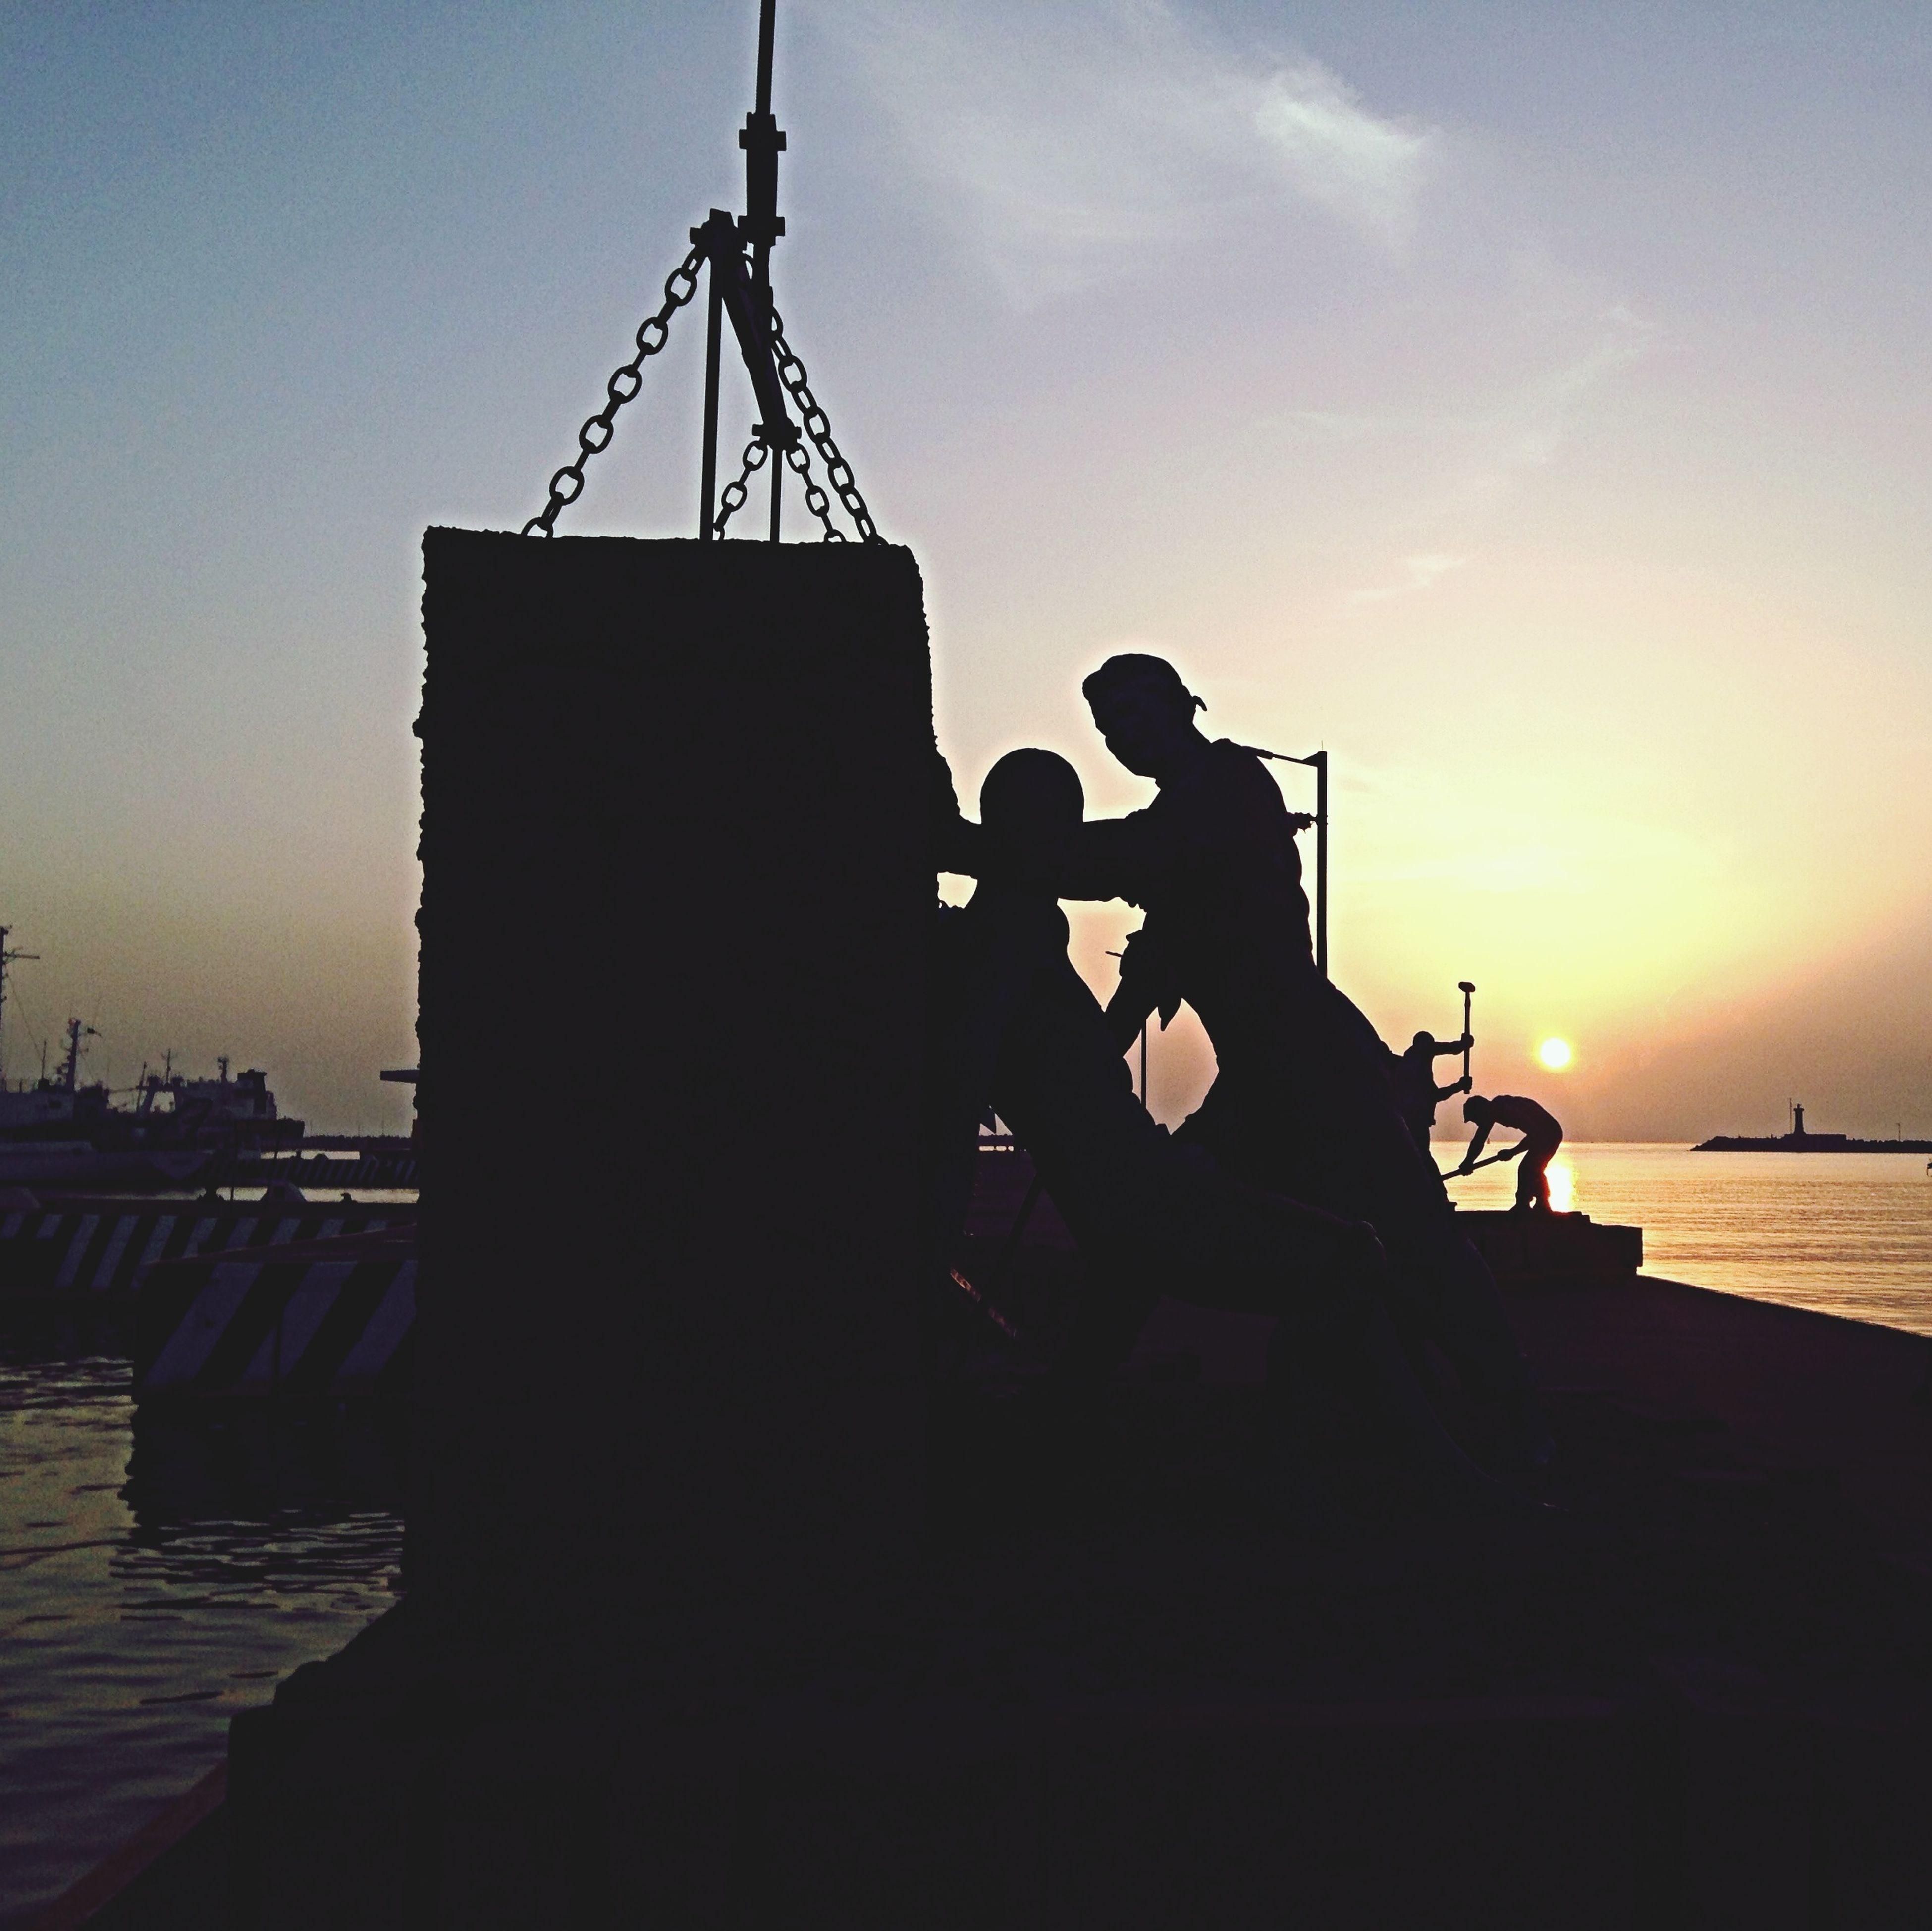 sunset, silhouette, sky, orange color, water, sun, nautical vessel, sea, built structure, transportation, mode of transport, crane - construction machinery, building exterior, architecture, sunlight, harbor, boat, outdoors, nature, dusk